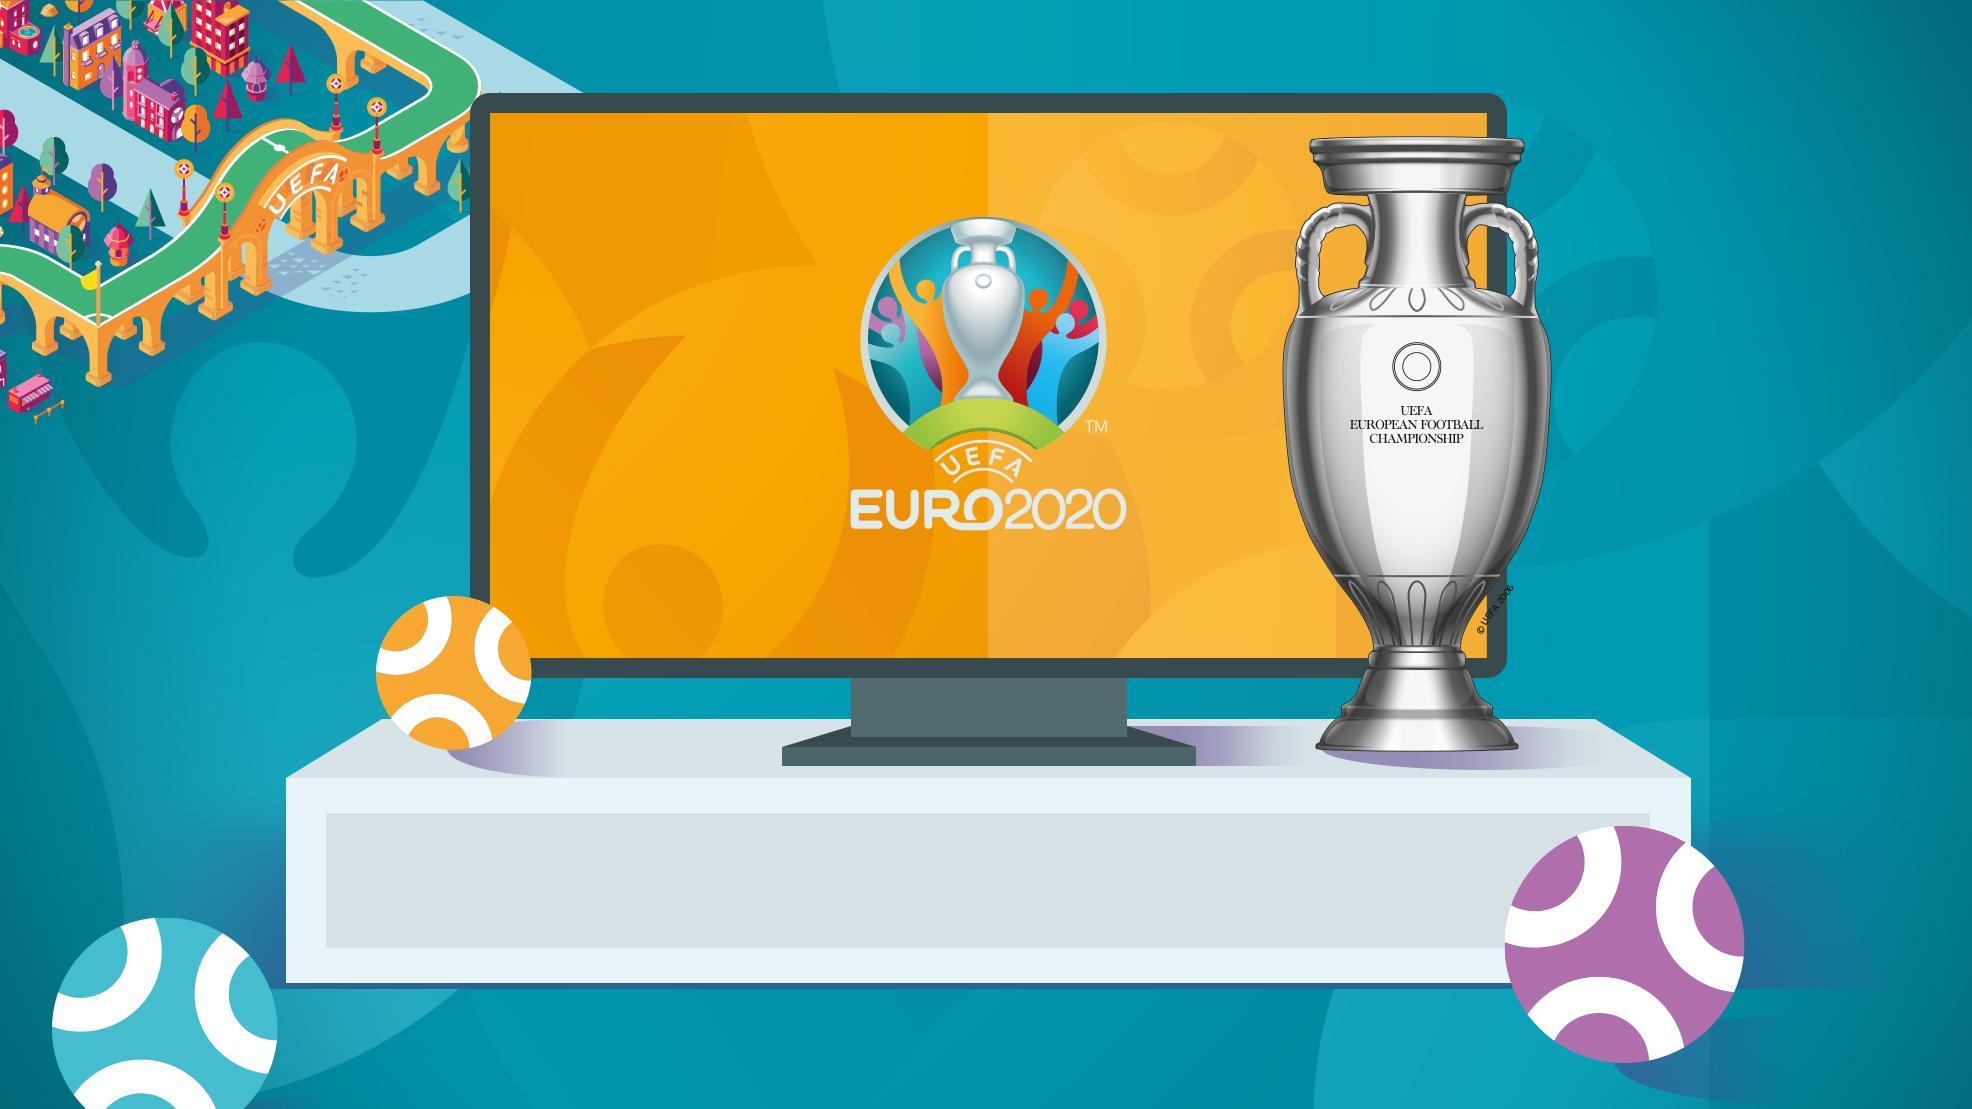 Where to watch the UEFA EURO 2020 final: TV broadcast partners, live streams